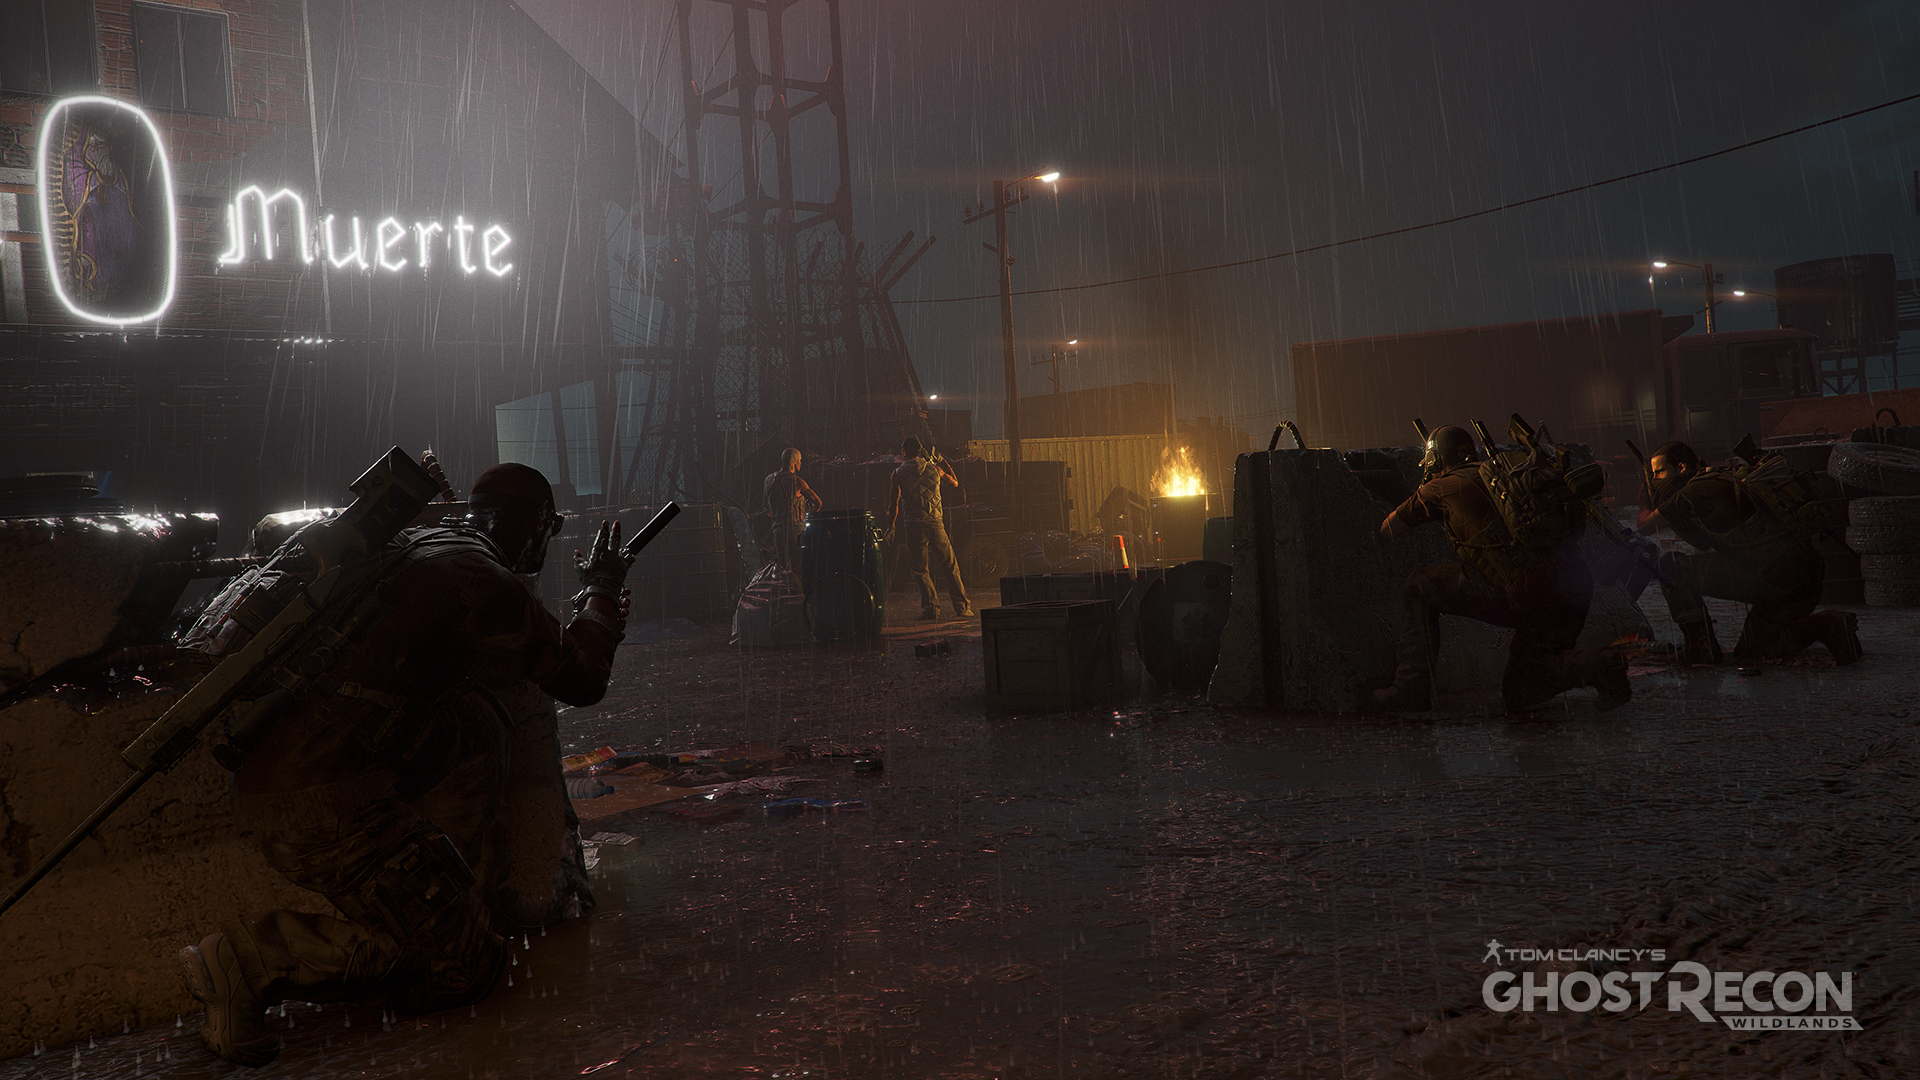 Tom Clancys Ghost Recon Wildlands Games Hd Games 4k Wallpapers